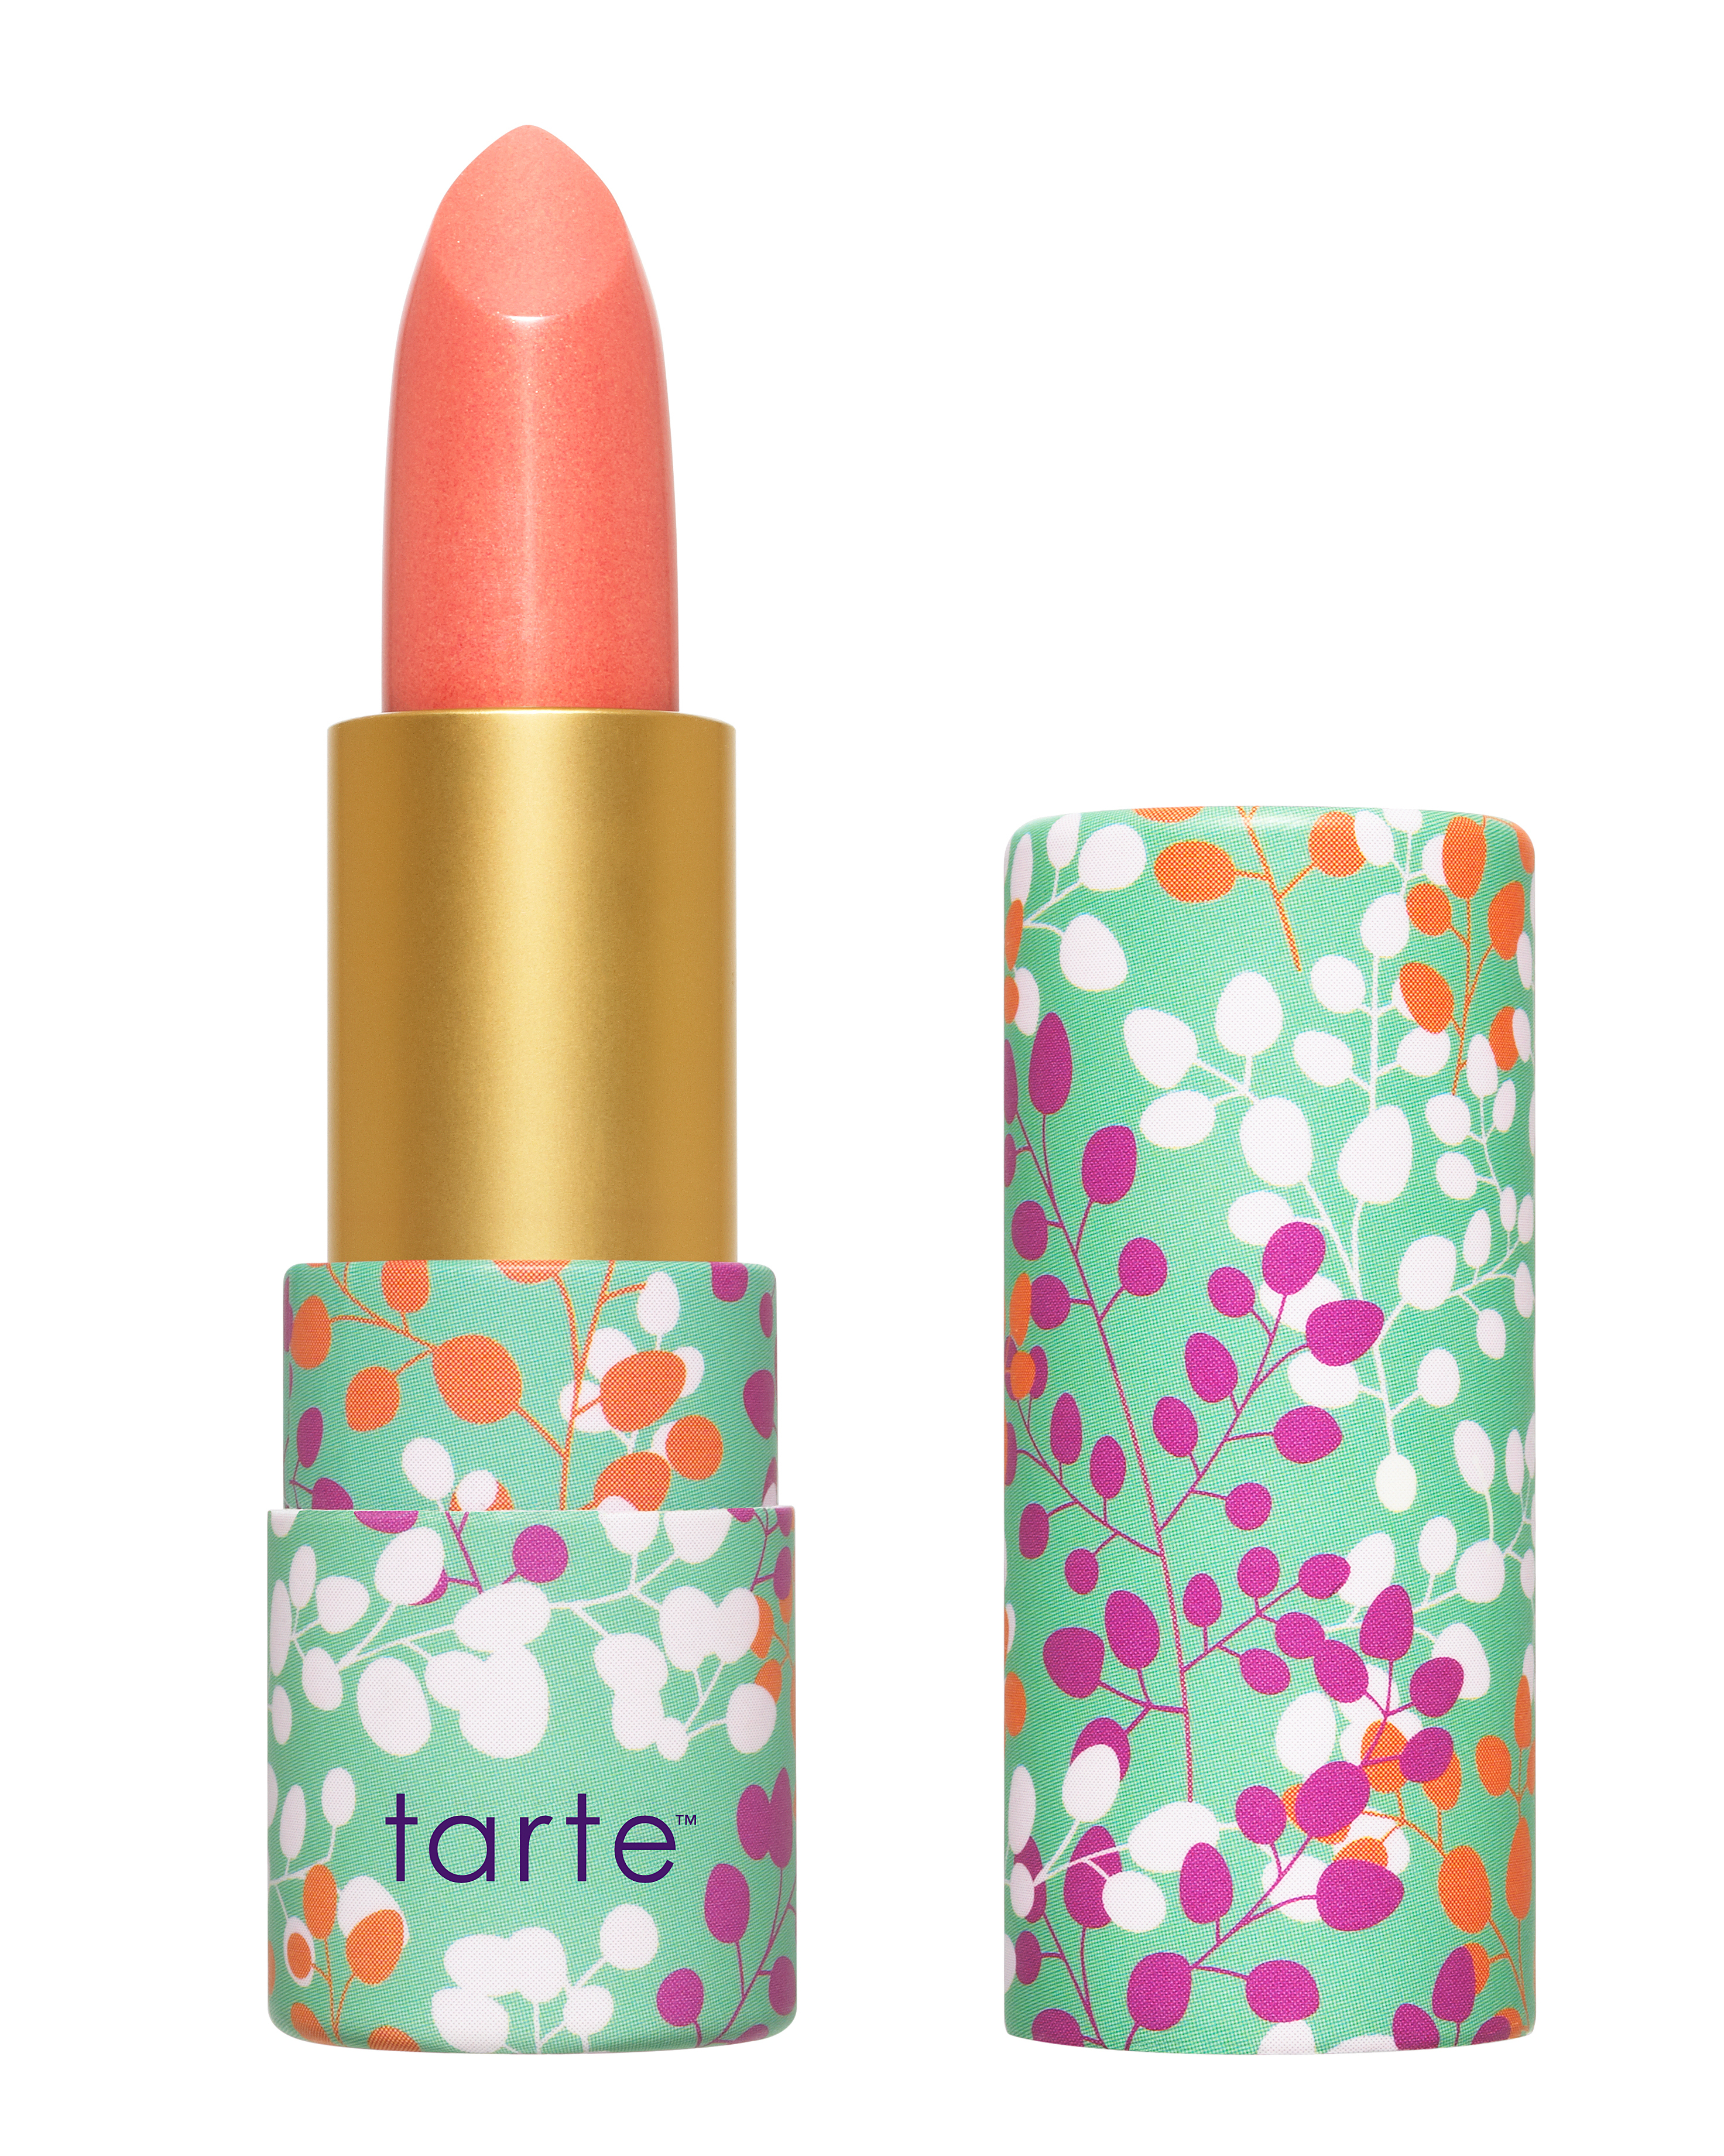 sarah-potempa-beauty-picks-tarte-glamazon-lipstick-0414.jpg